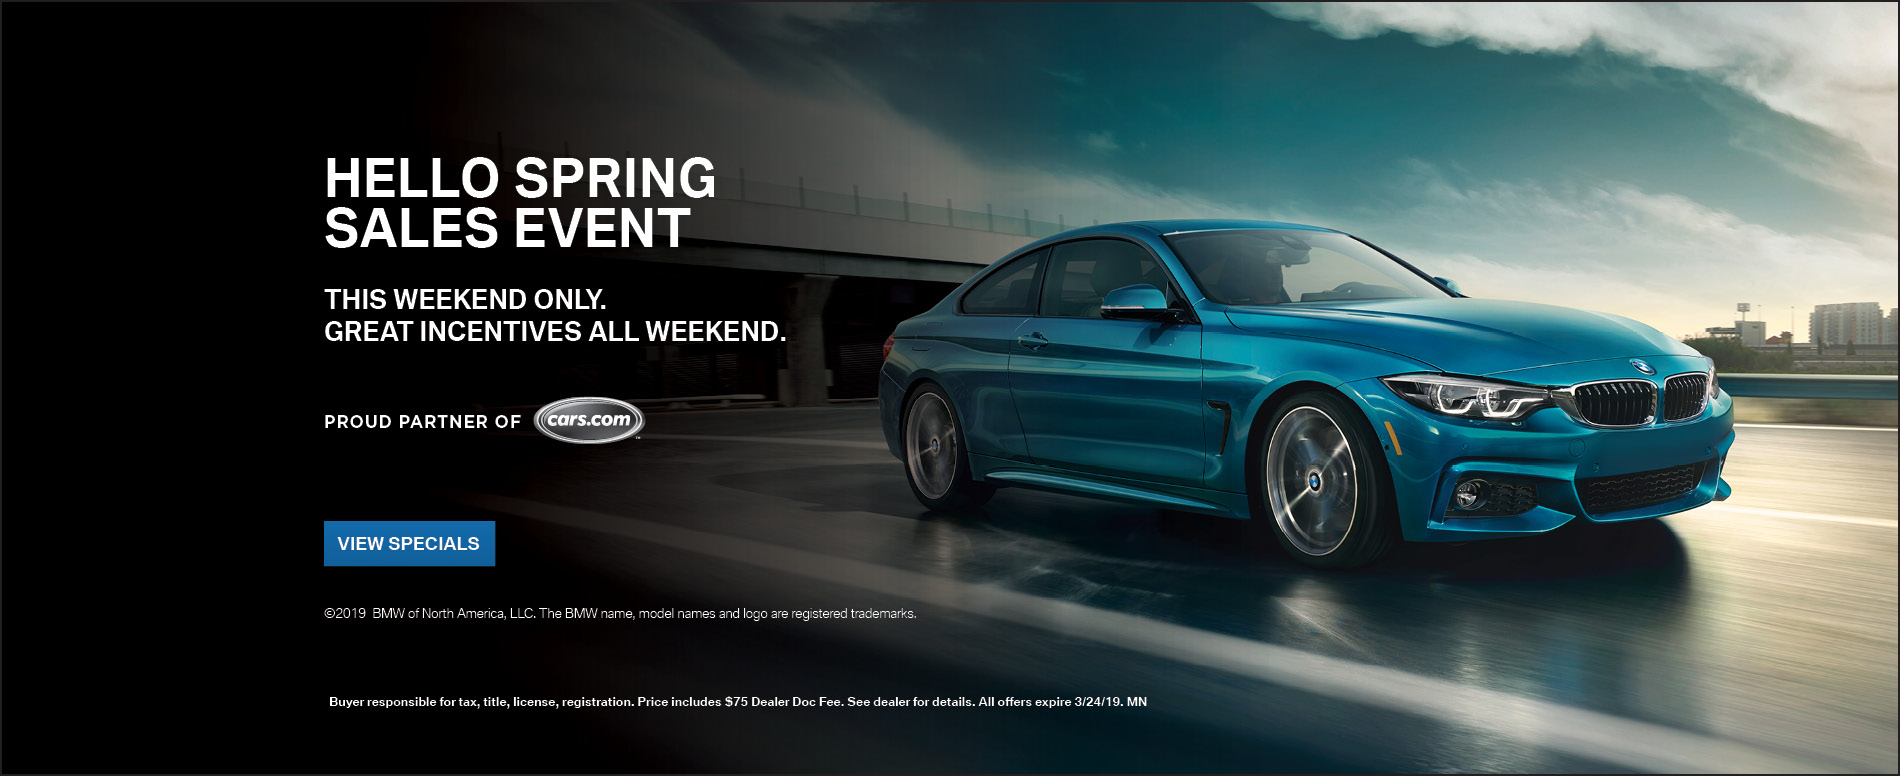 Hello Spring Sales Event